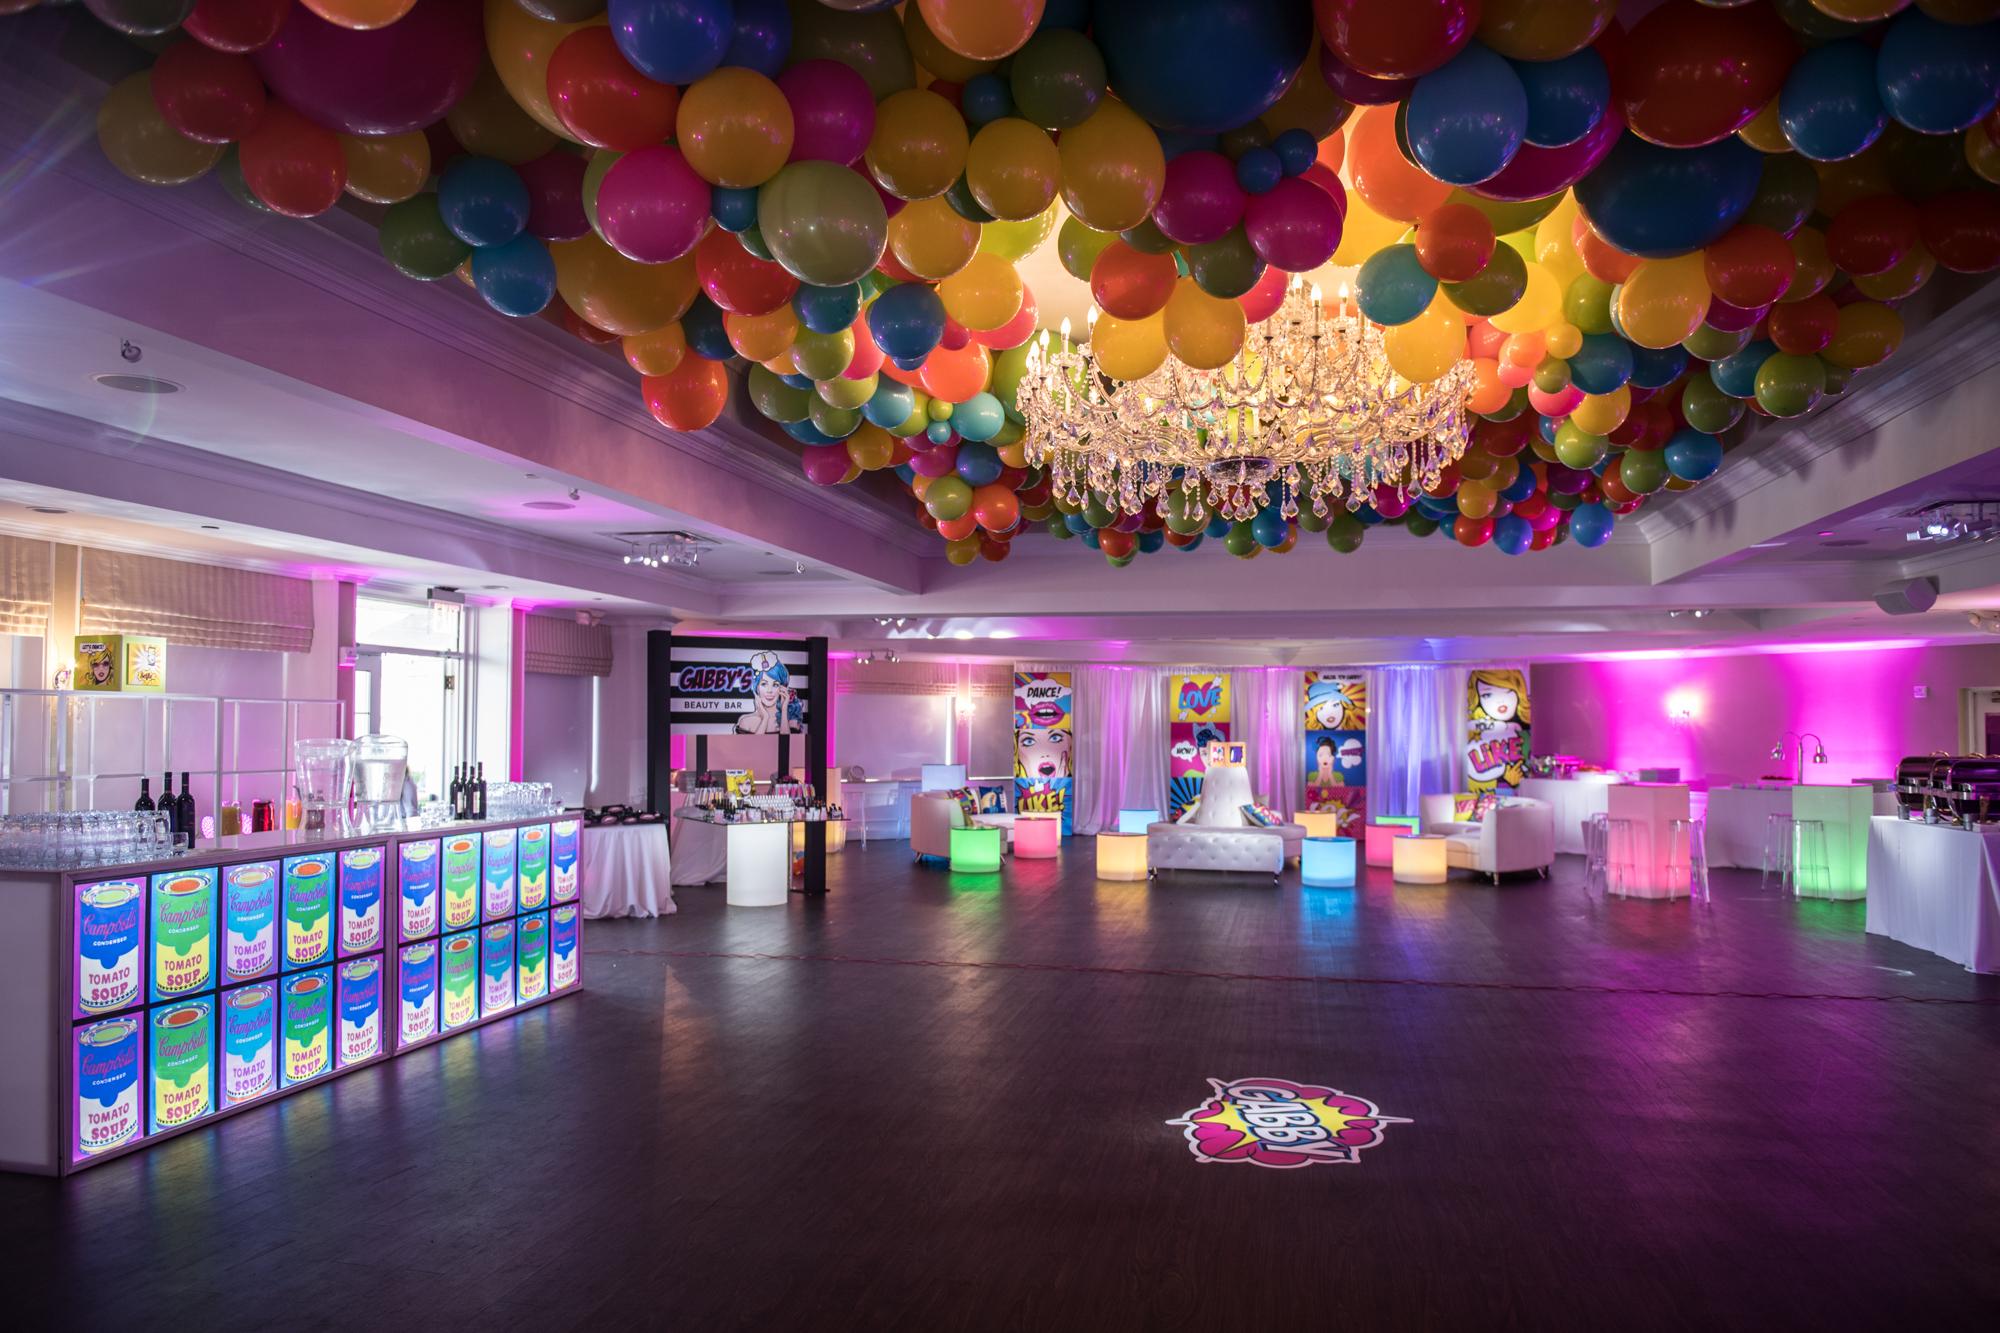 A Pop Art Party!